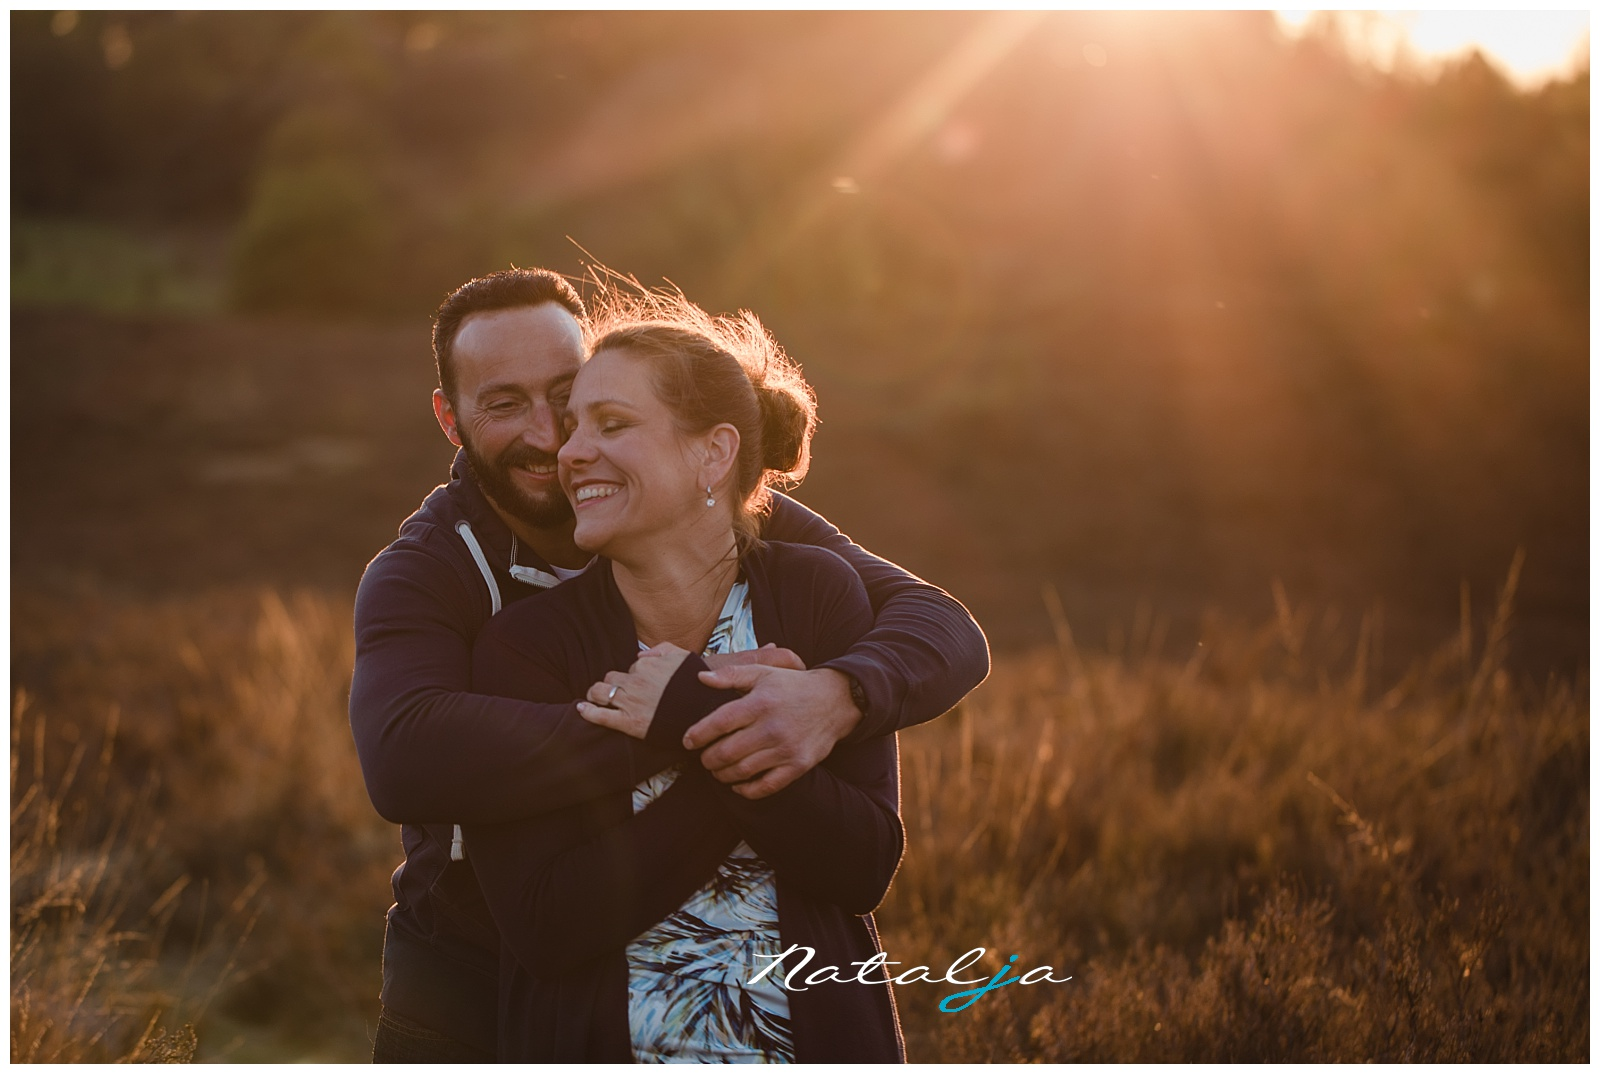 Loveshoot Brunsummerheide Limburg | Danielle, Pascal en Elise